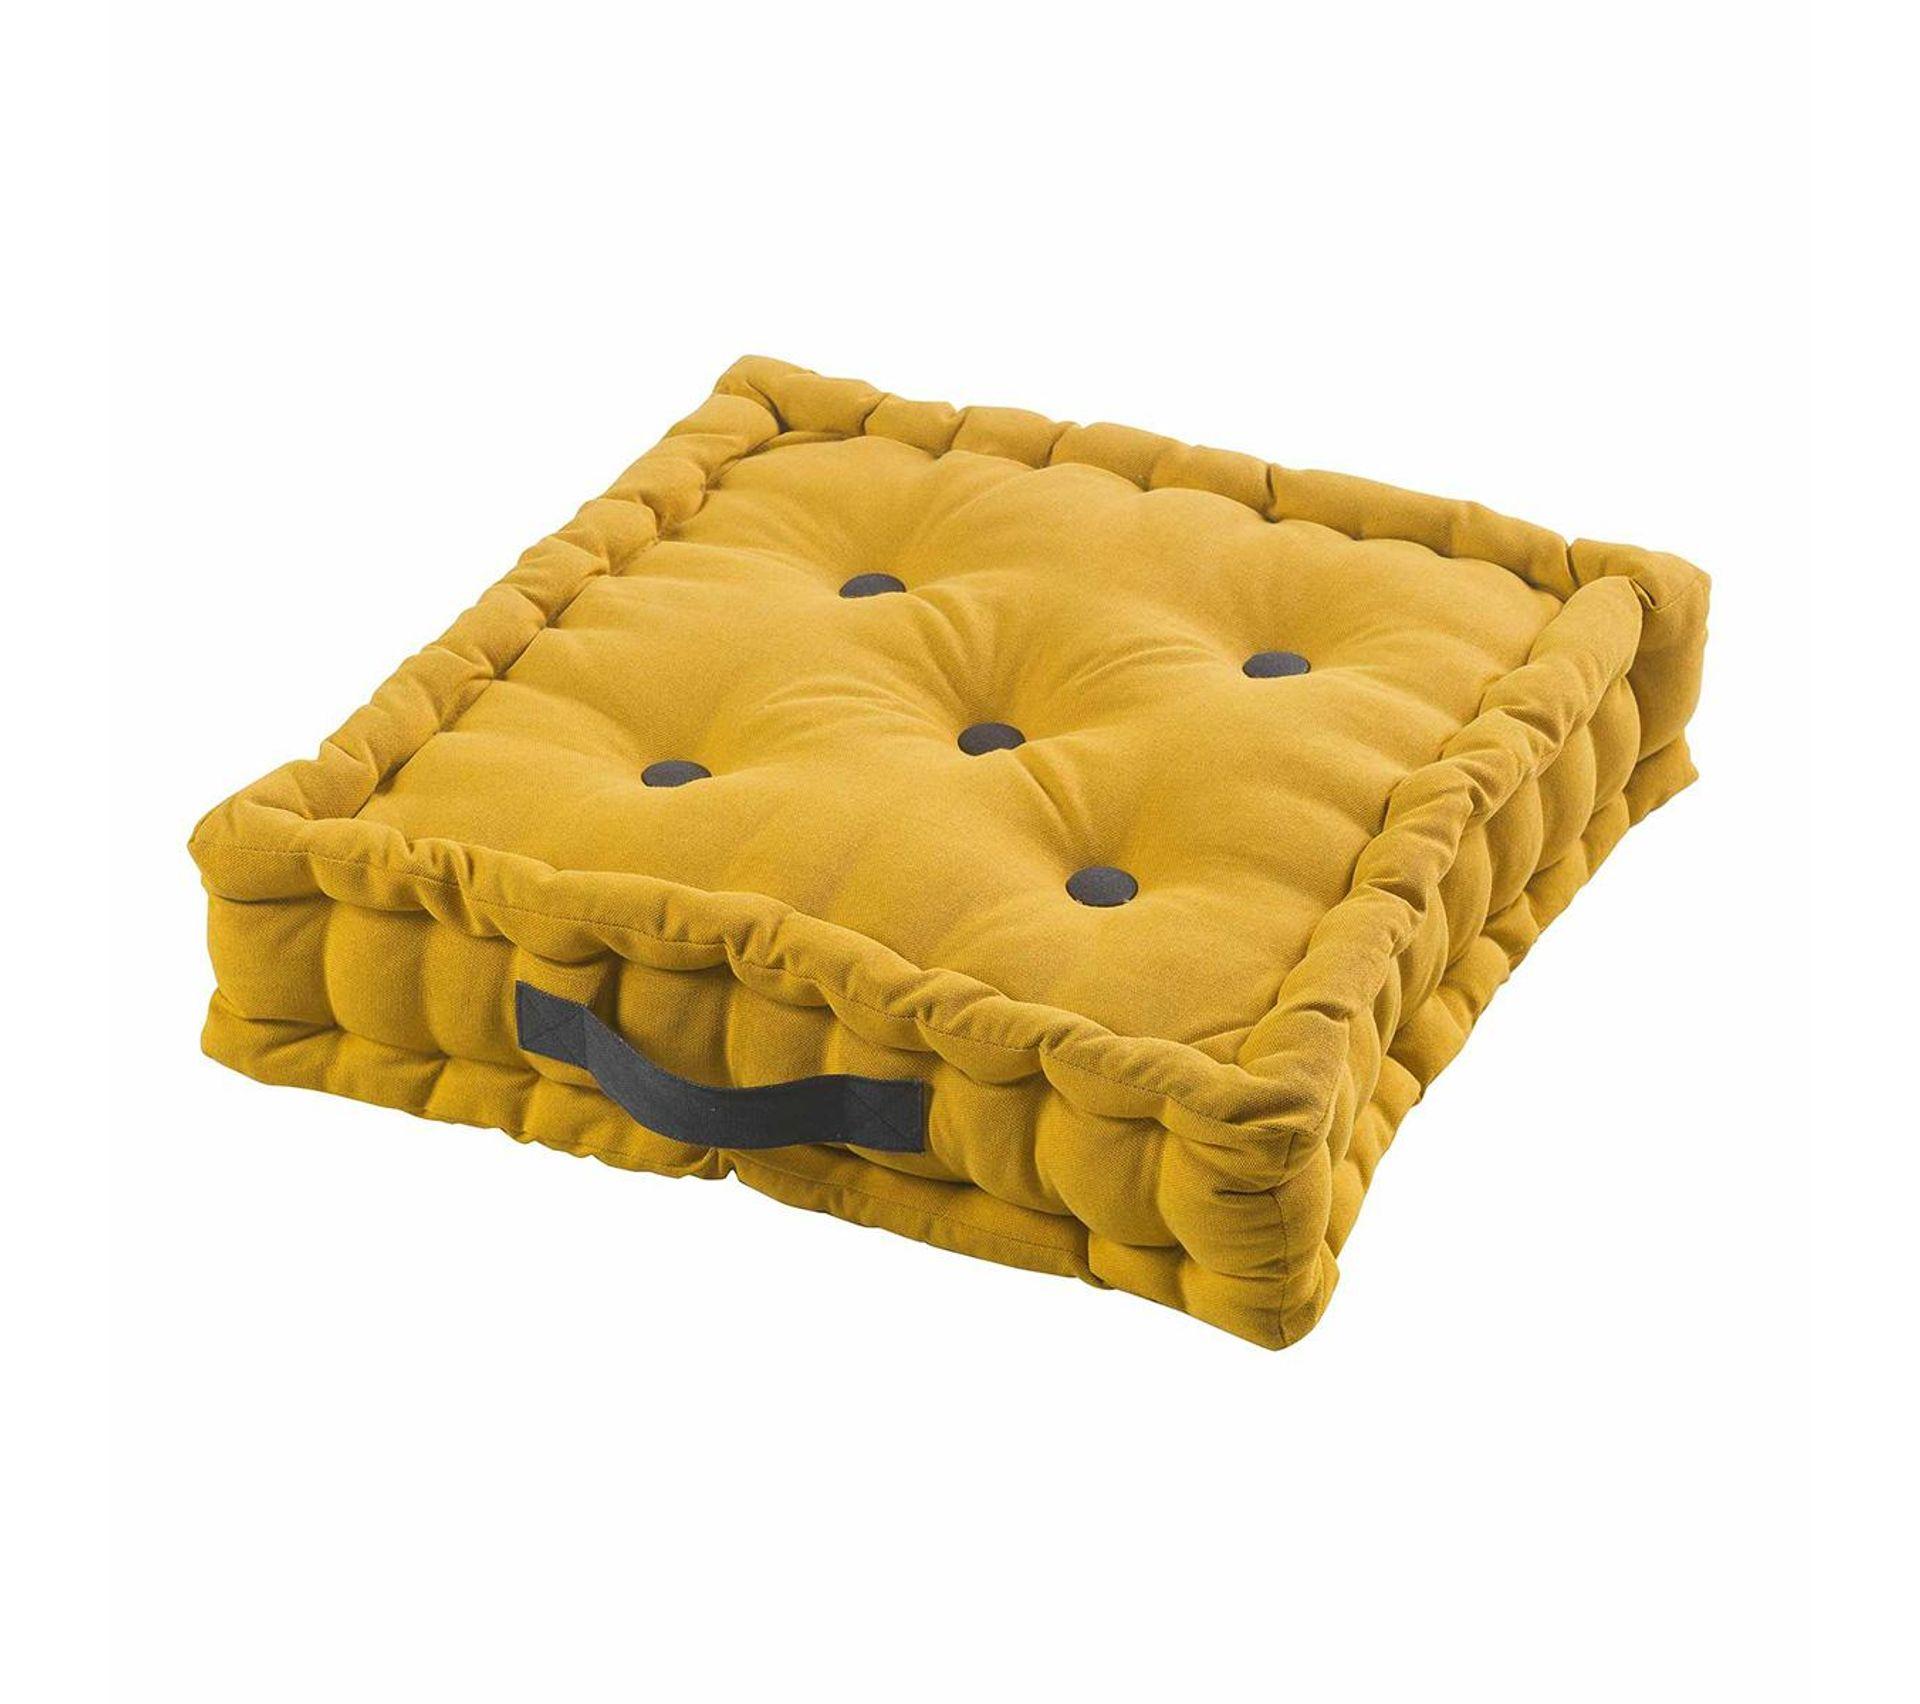 coussin tapissier 10x10 - 10% remise - www.muminlerotomotiv.com.tr